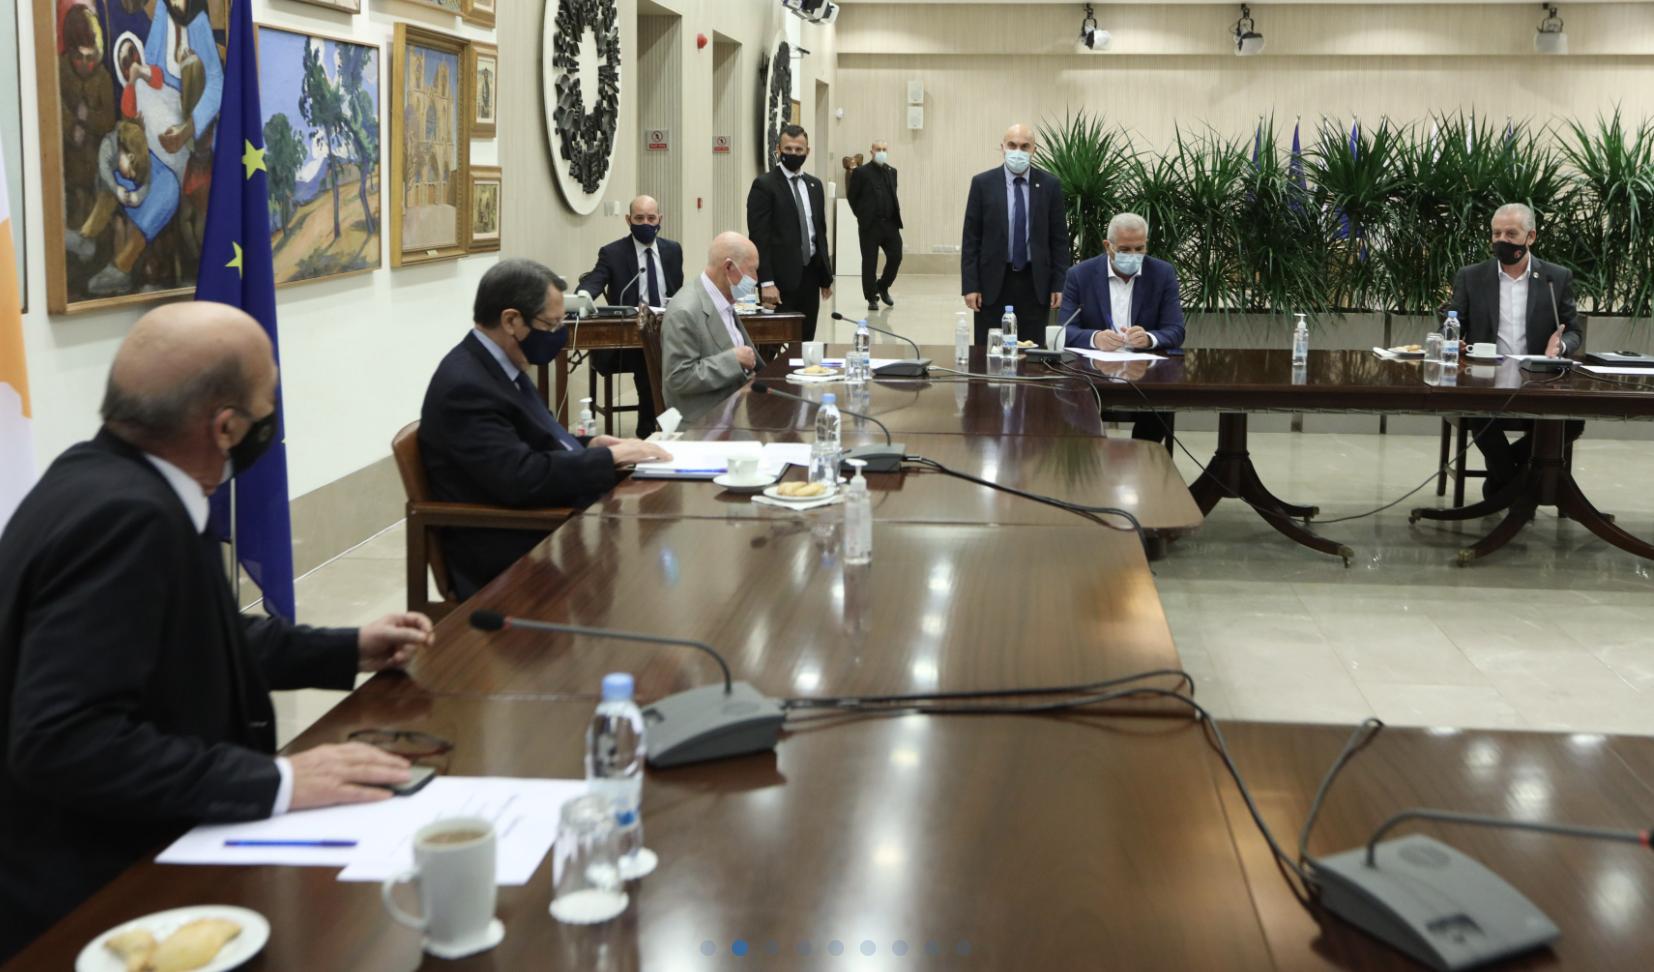 Cyprus: Anastasiades briefed political leaders on developments in Cyprus